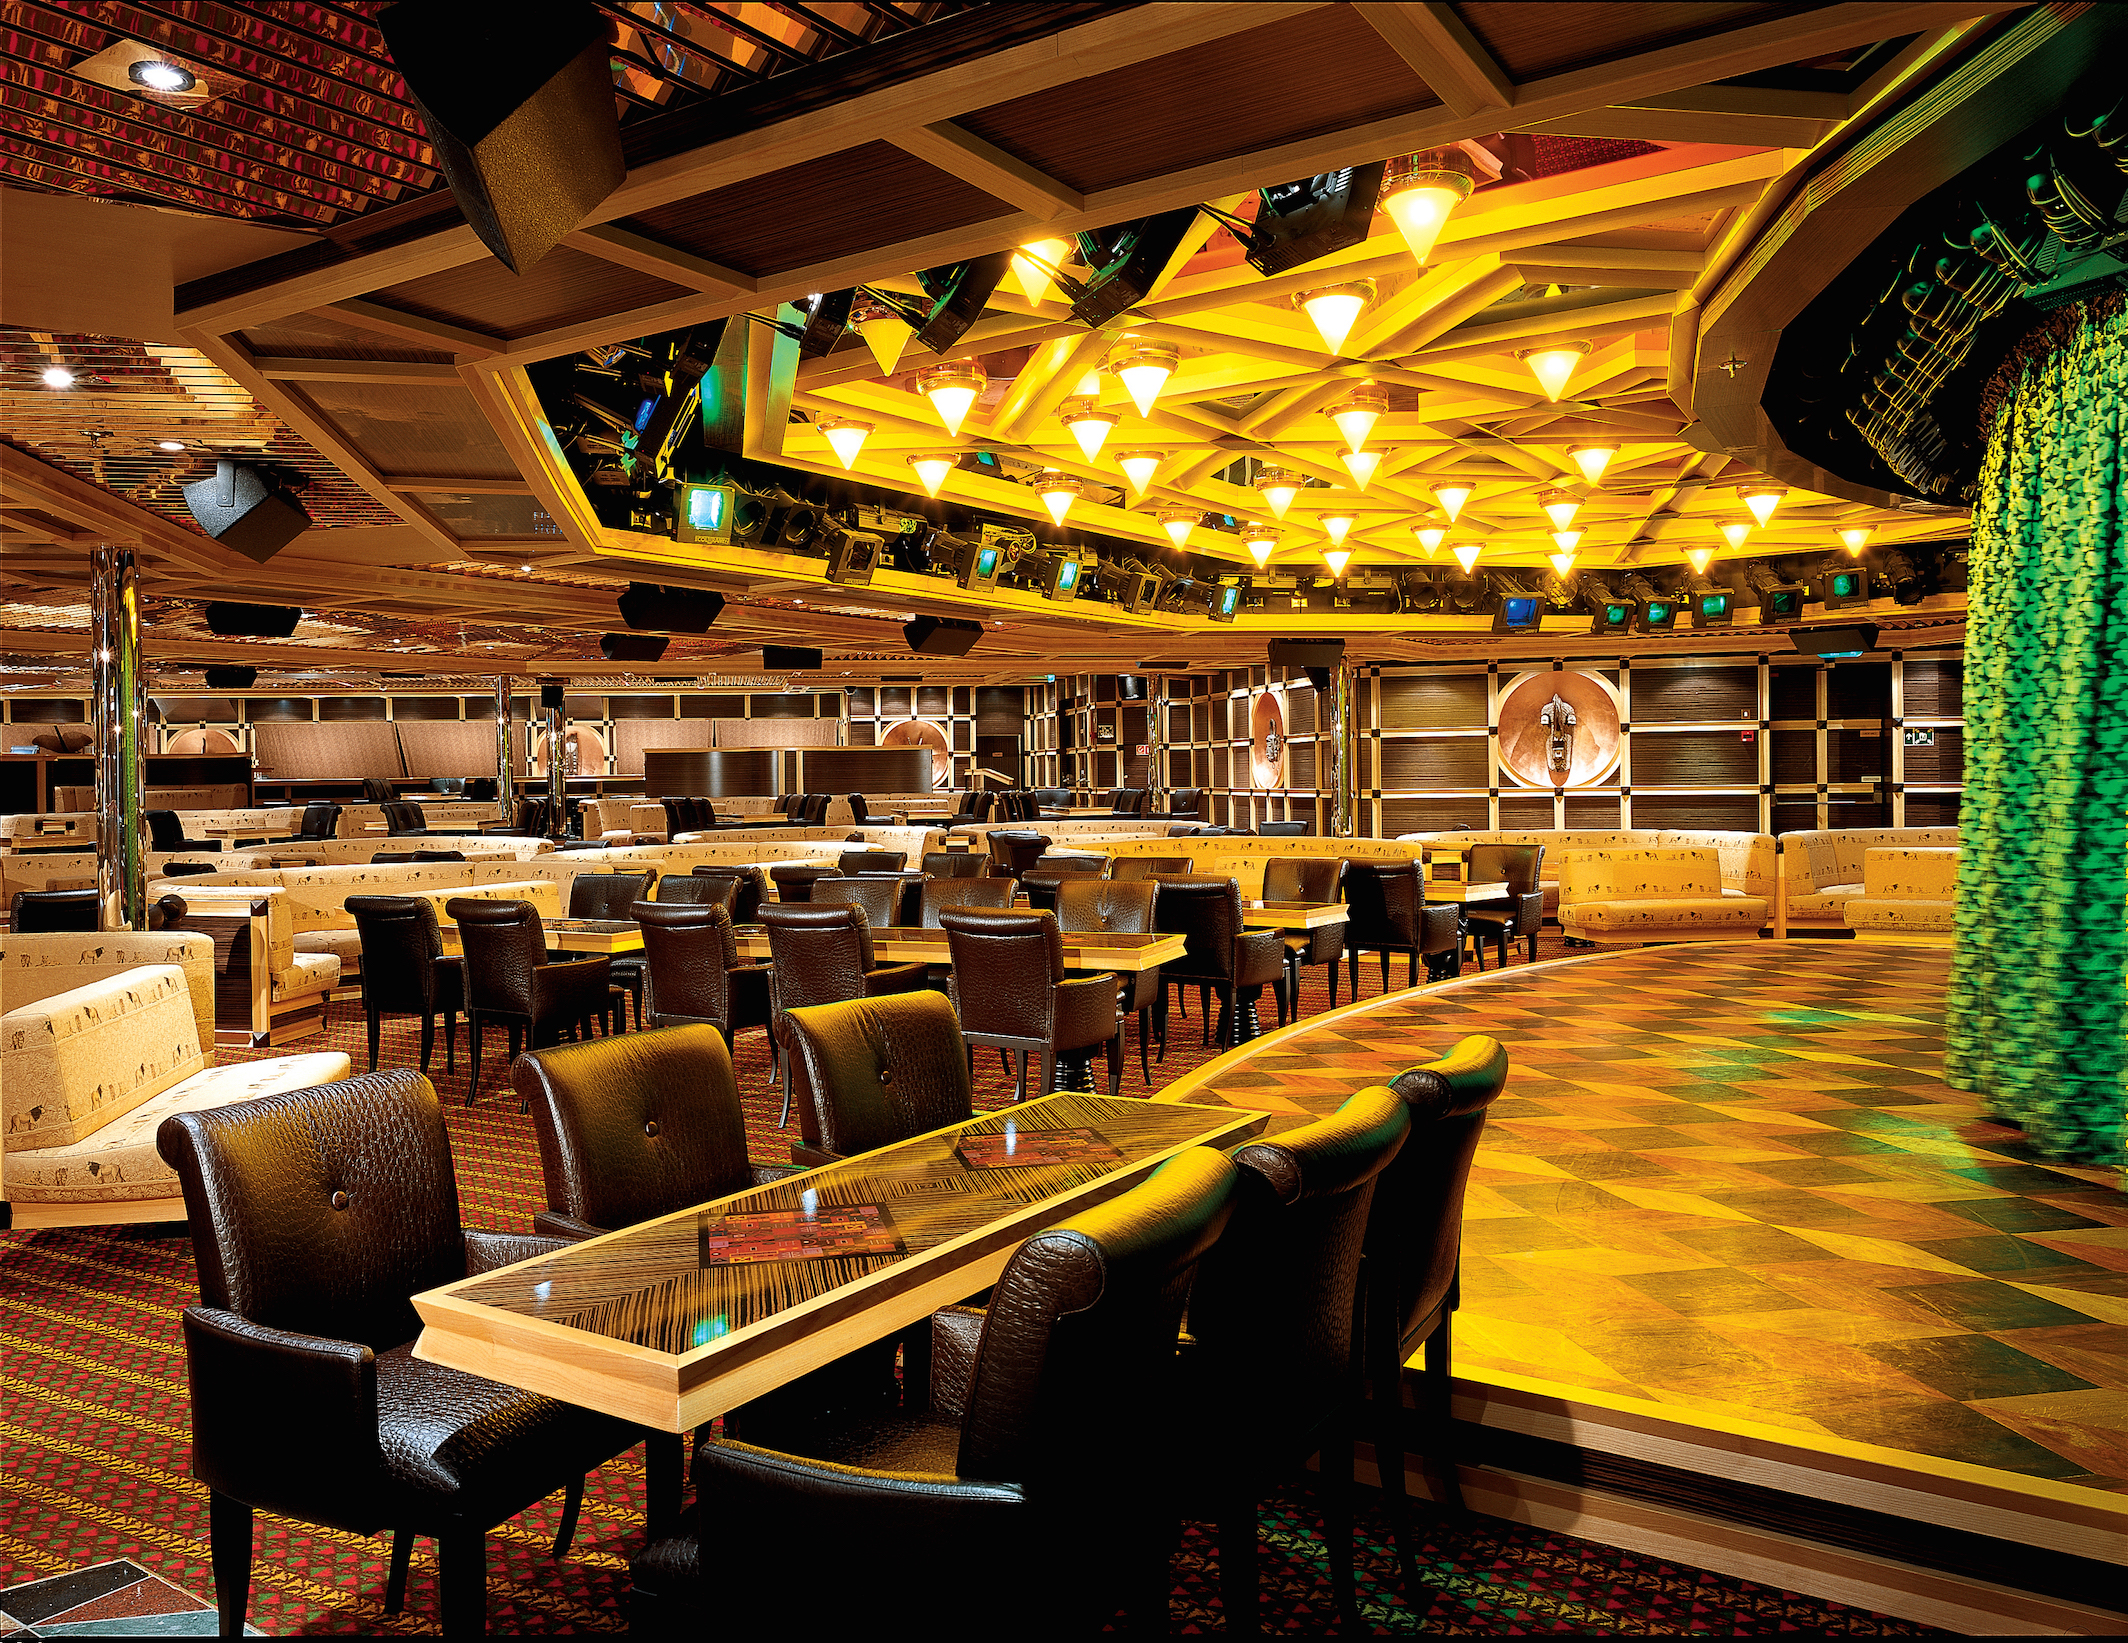 Carnival Glory Ebony Lounge 3.jpg